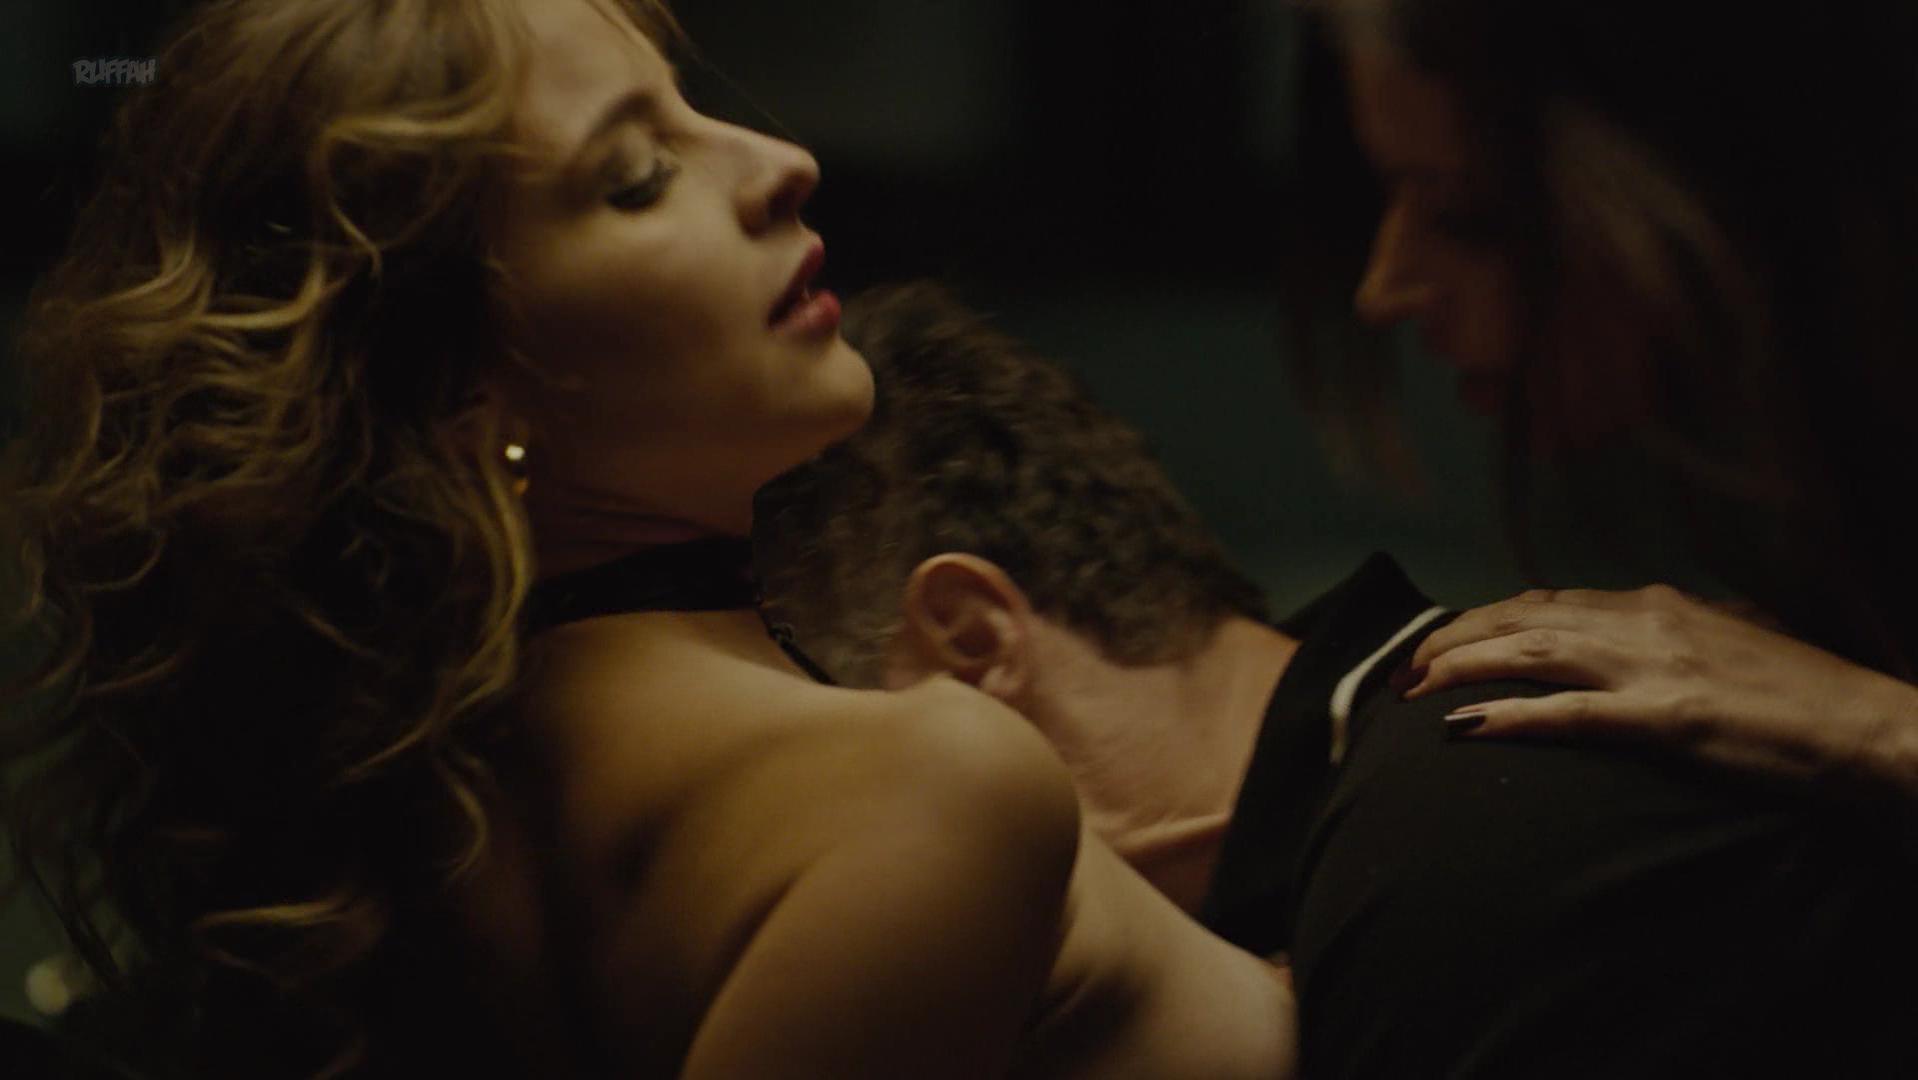 Louise Clos nude, Raquel Rocha nude - O Mecanismo s01e02 (2018)